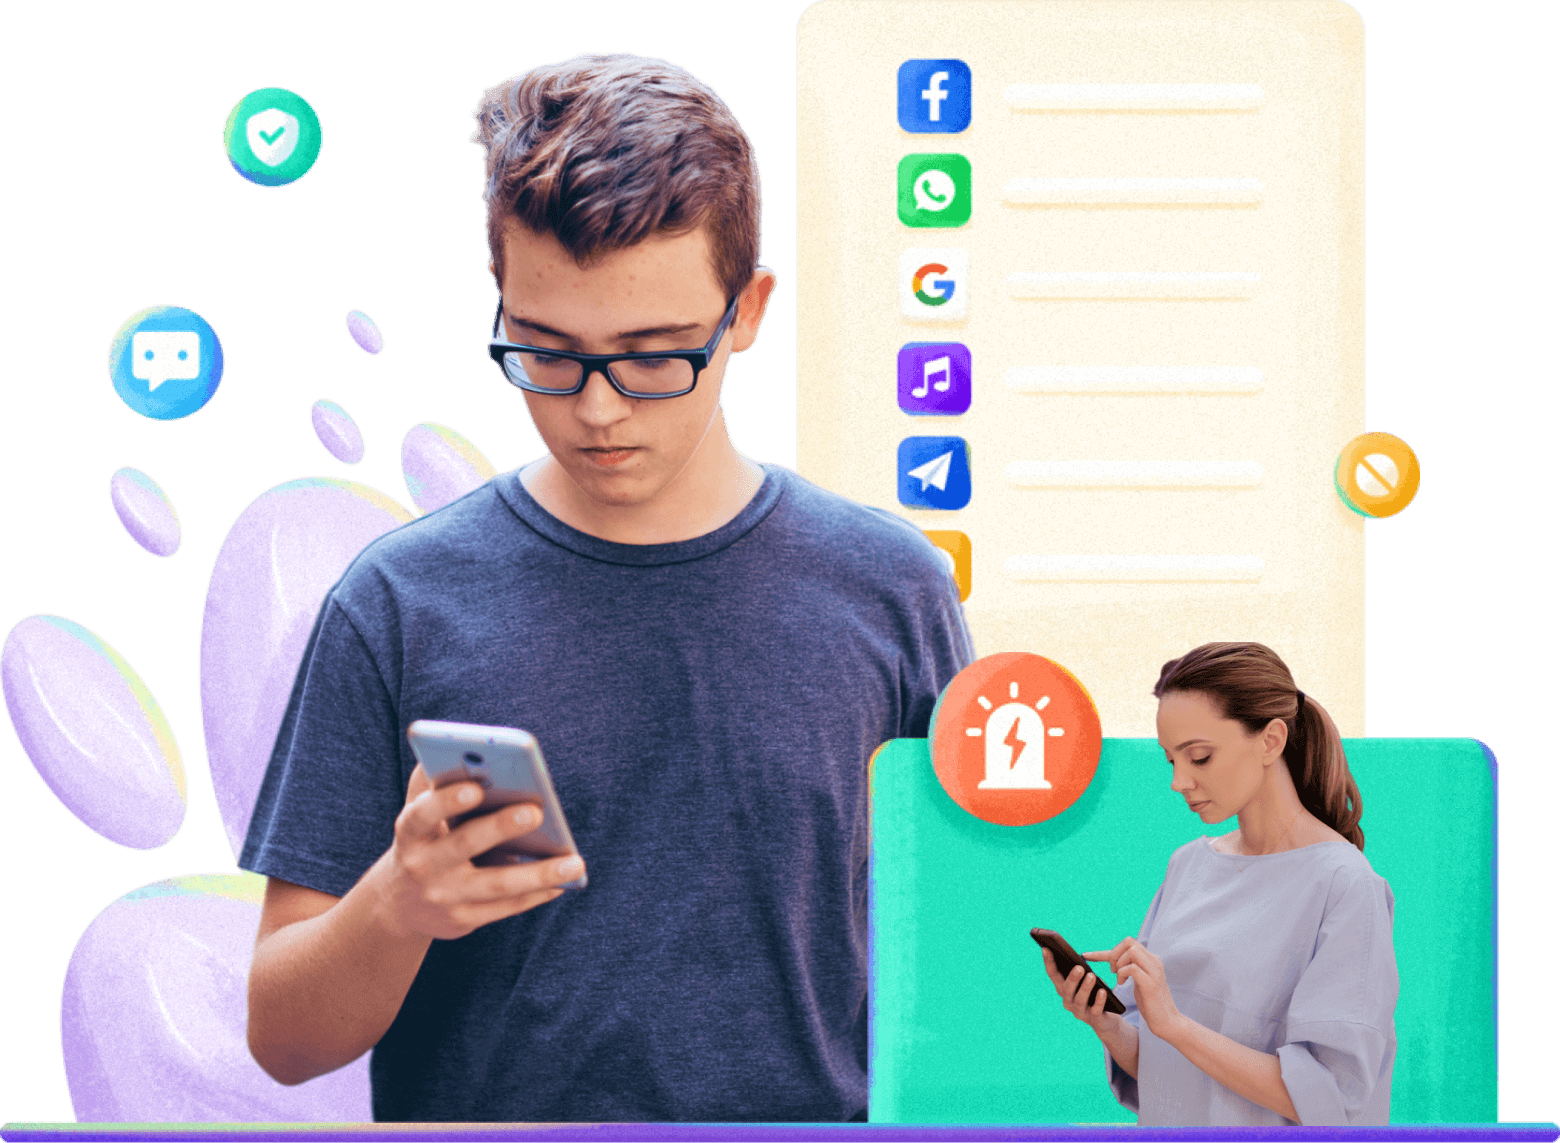 social media detect